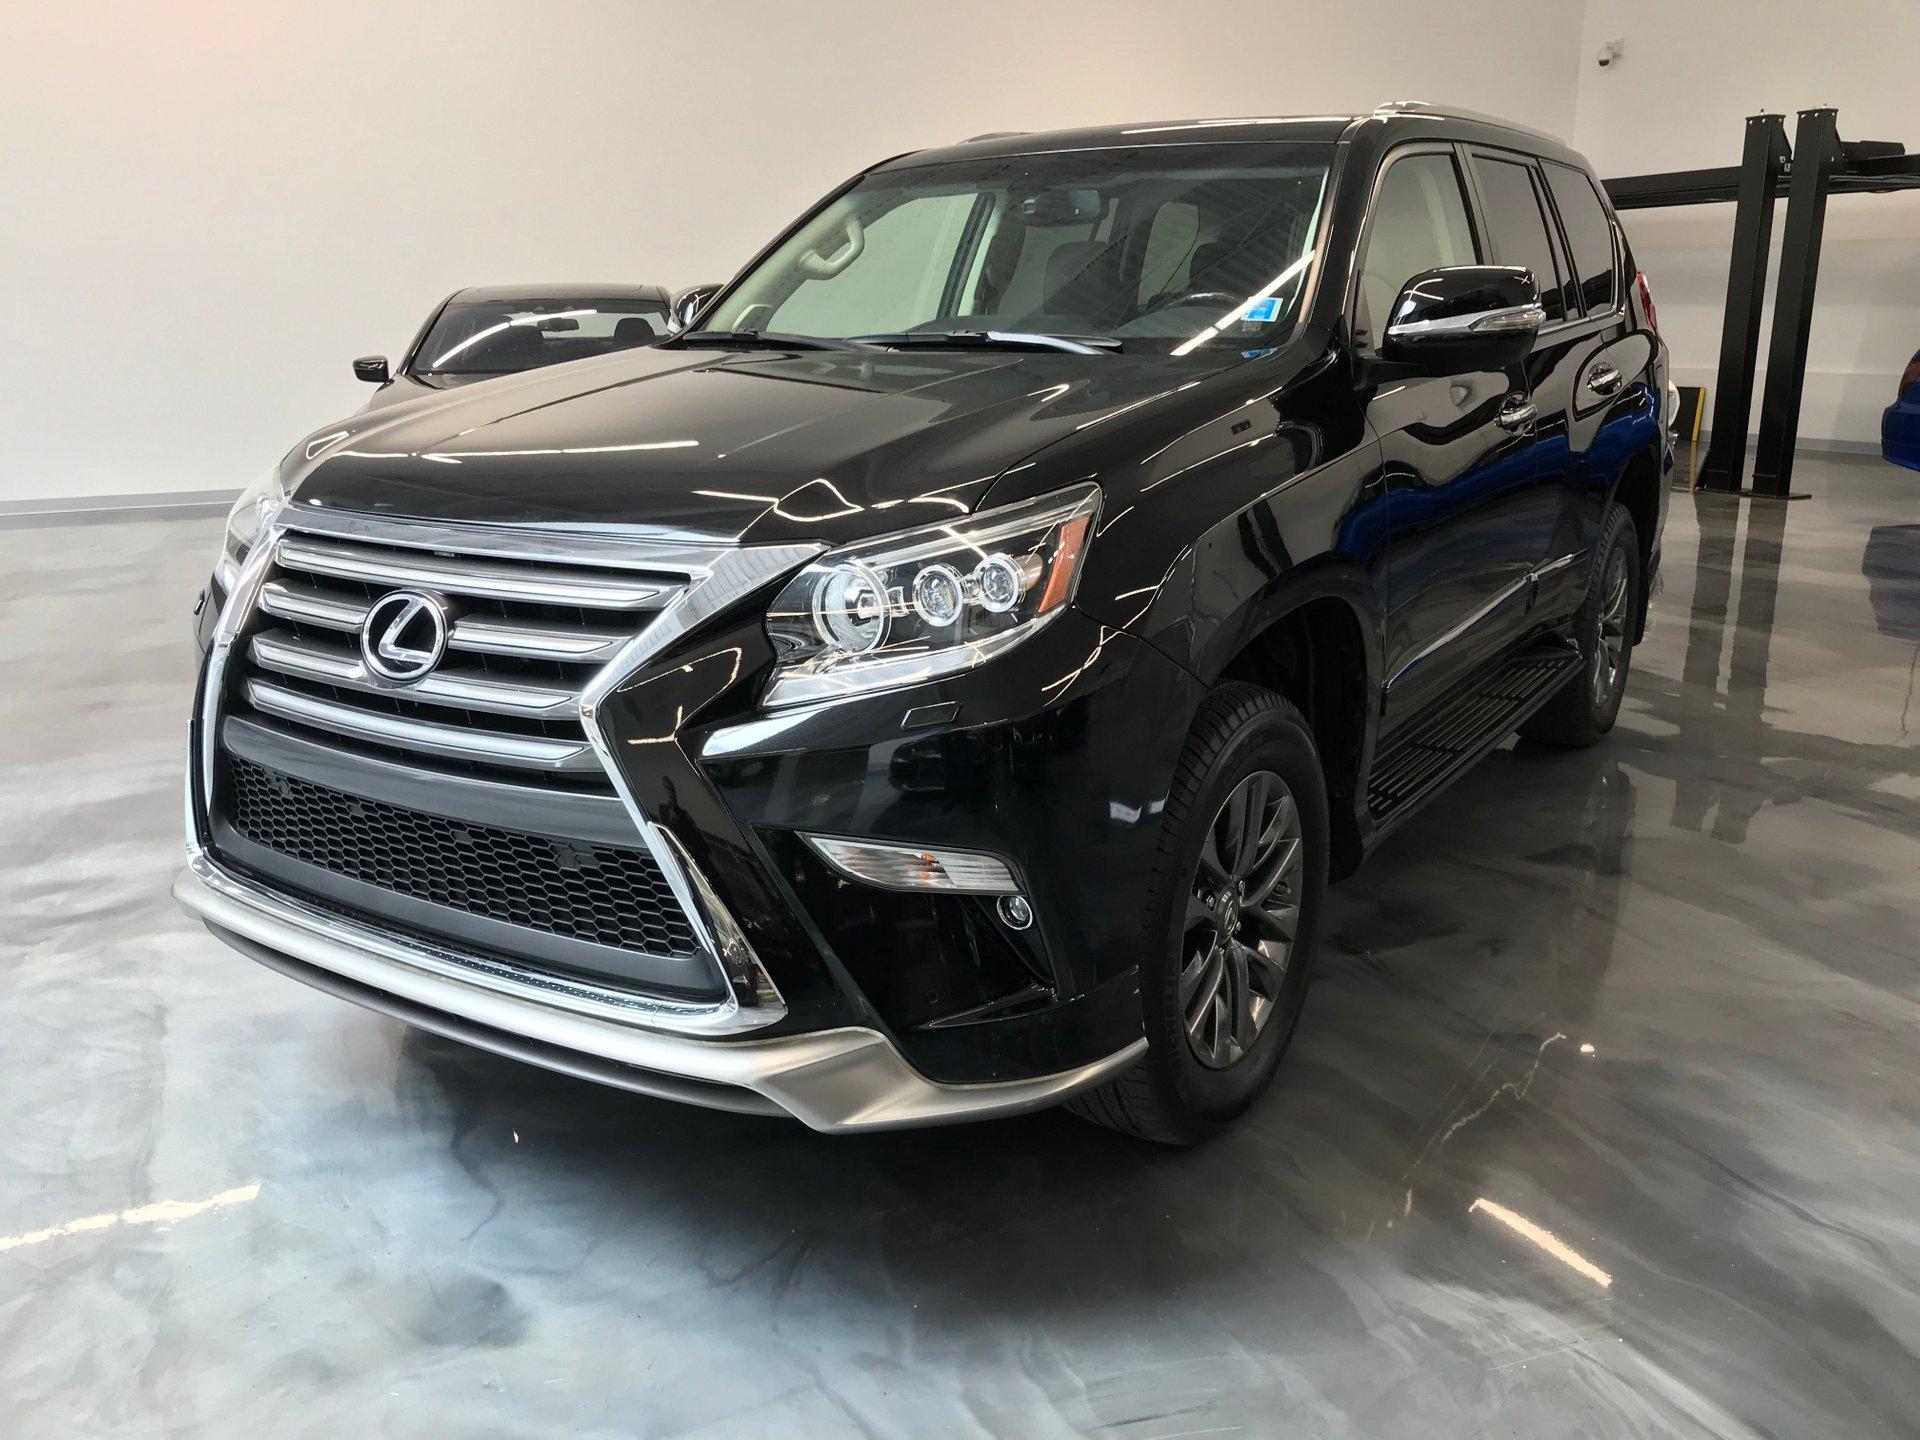 2018 lexus gx460 sold